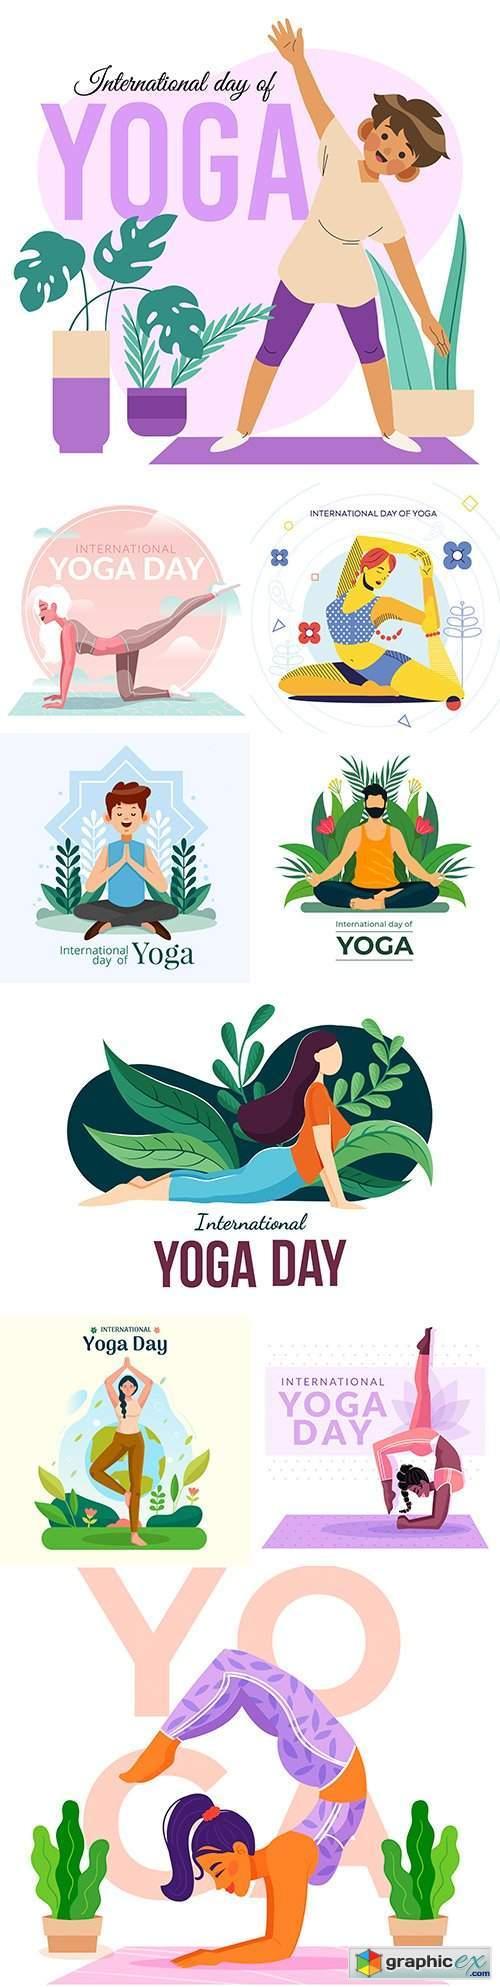 Yoga International day and meditation design illustration 8